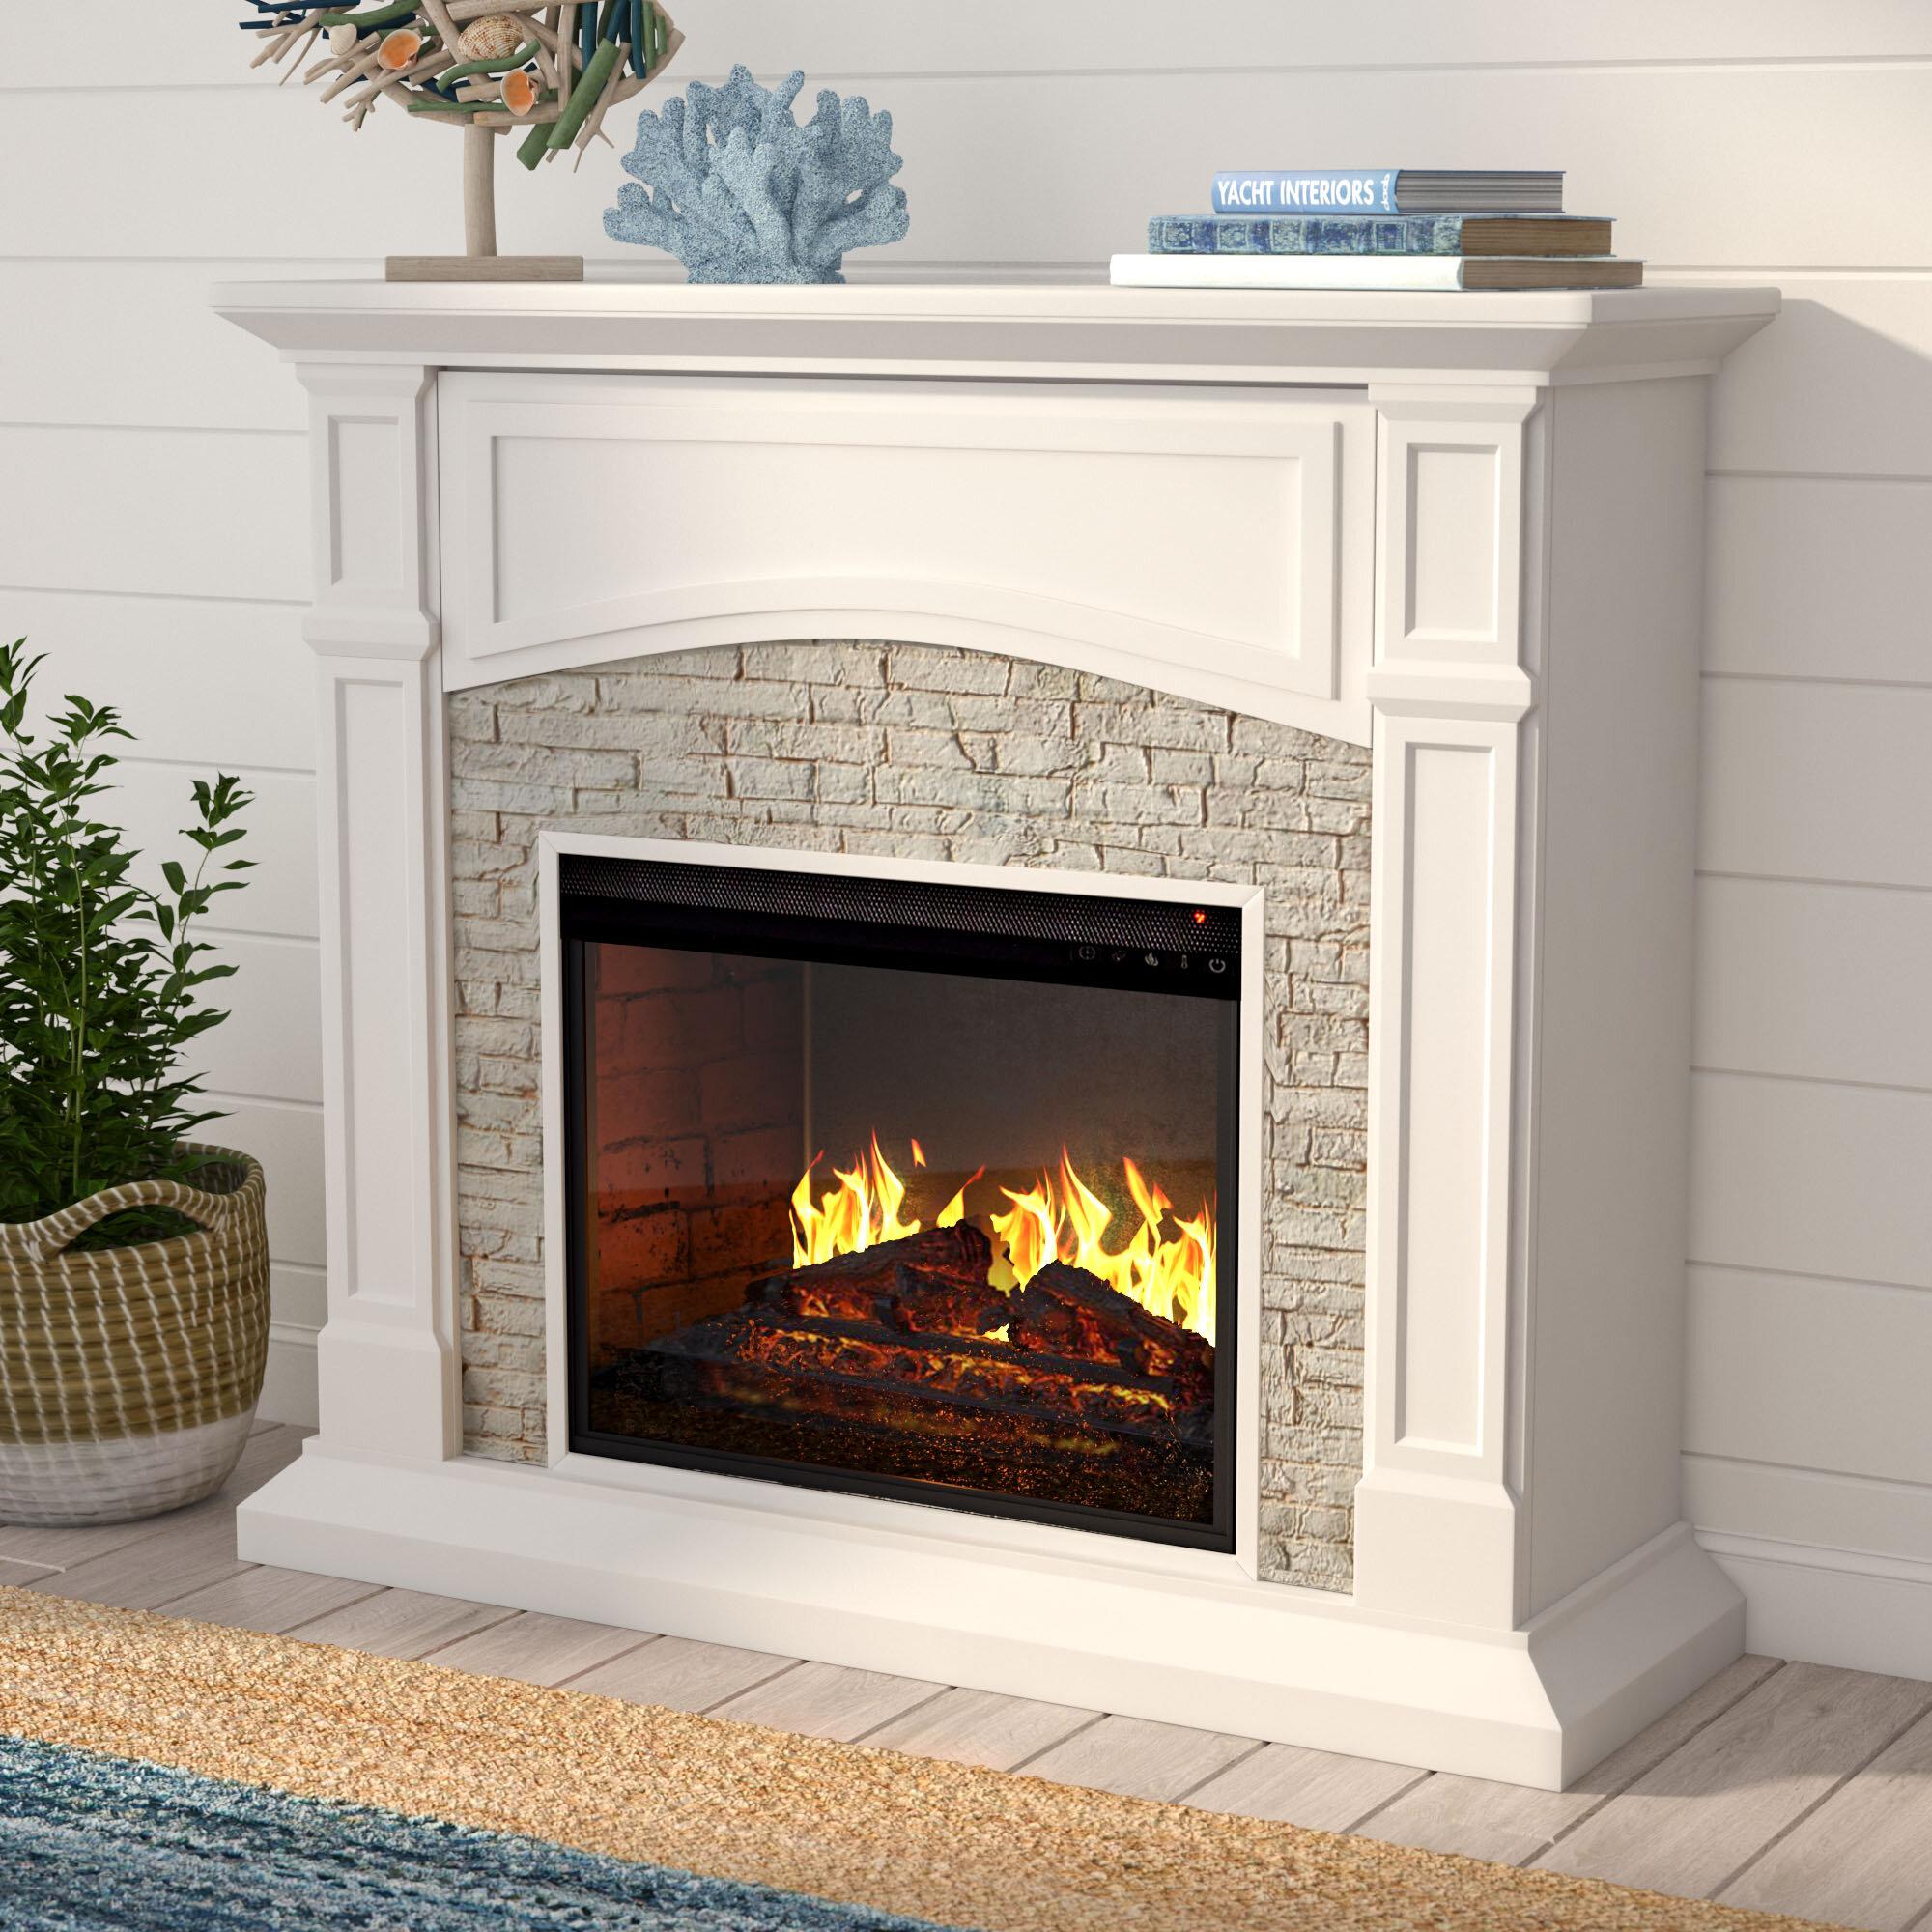 firepalce astria fireglass linear inc nickel gas web brushed shop fireplaces rhapsody ams fireplace